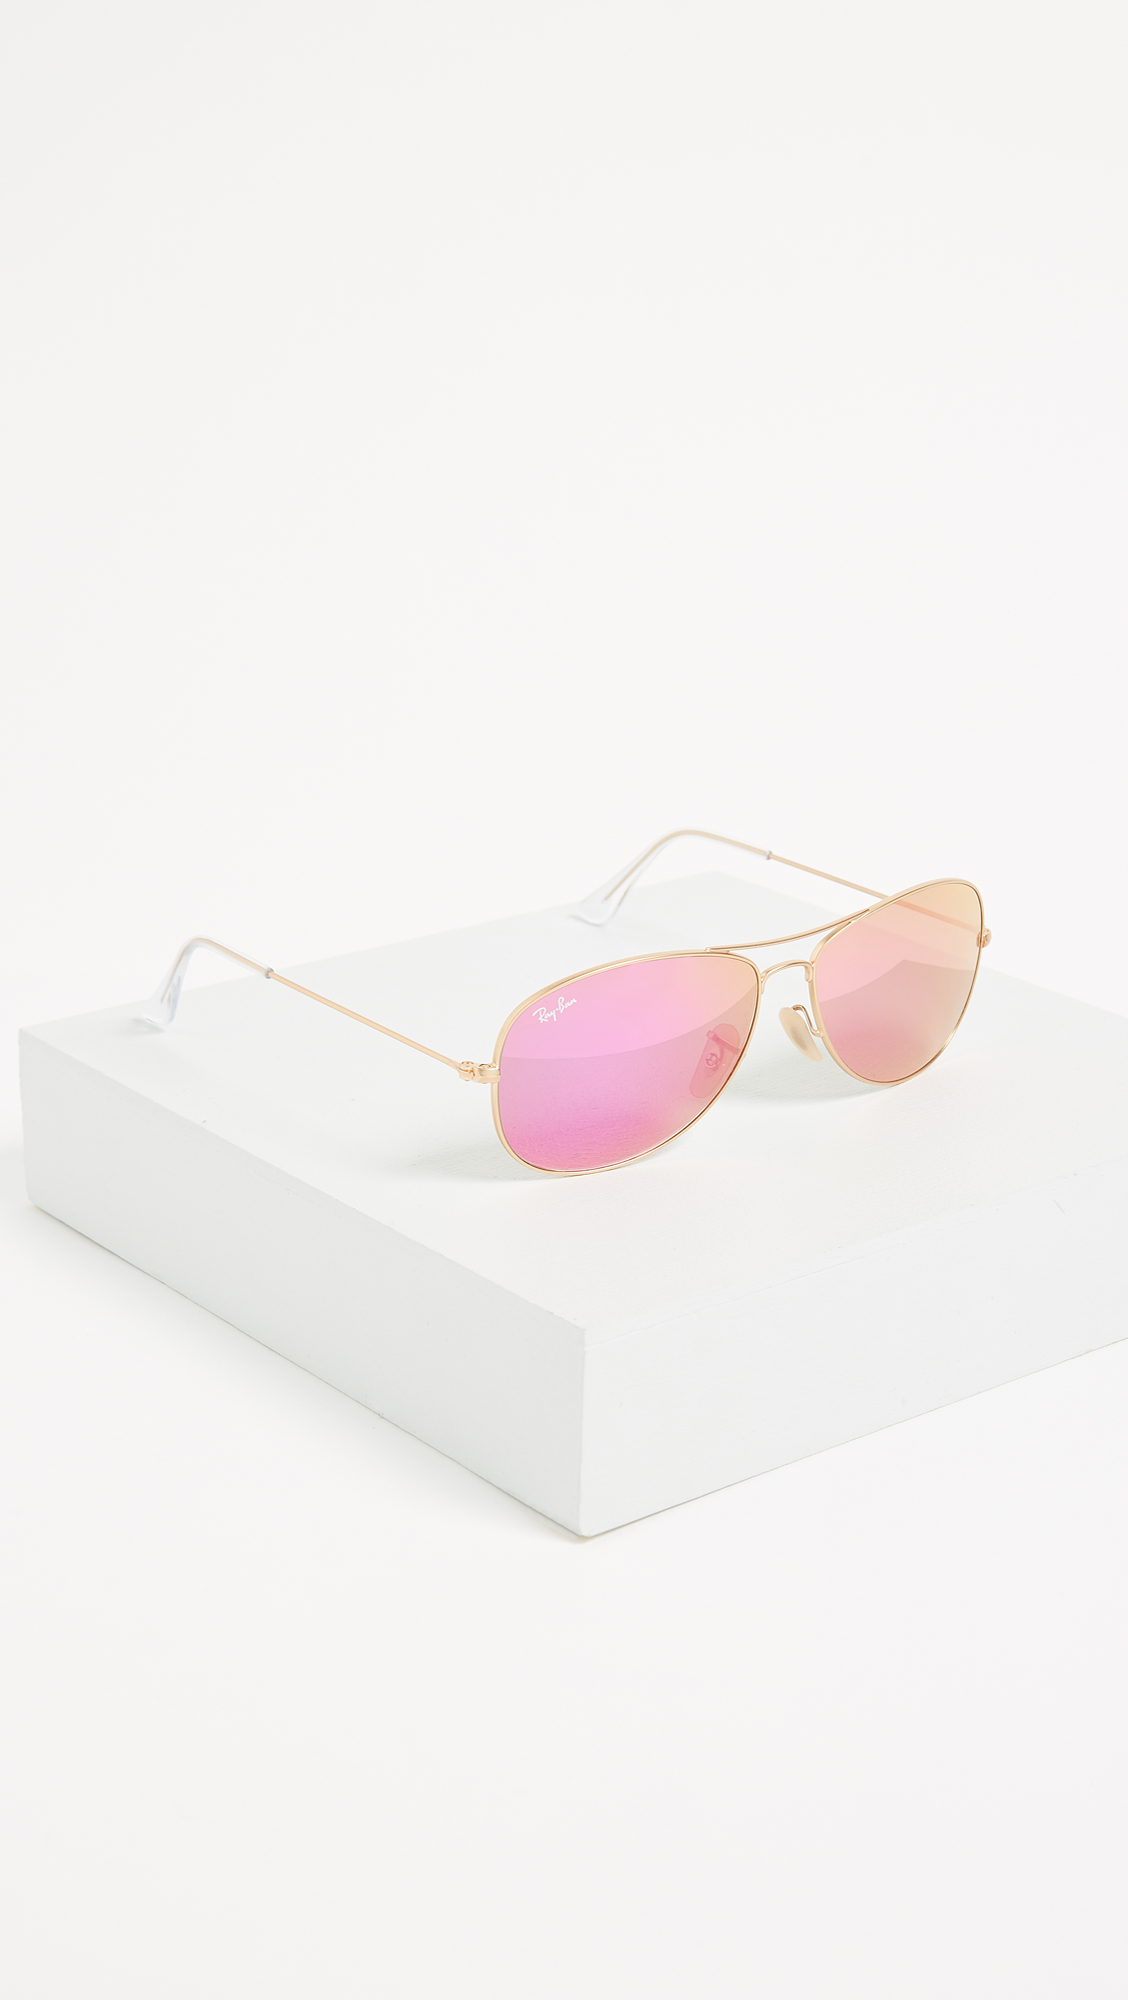 3adb69c65d Ray-Ban RB3362 Mirrored Shrunken Aviator Sunglasses   SHOPBOP